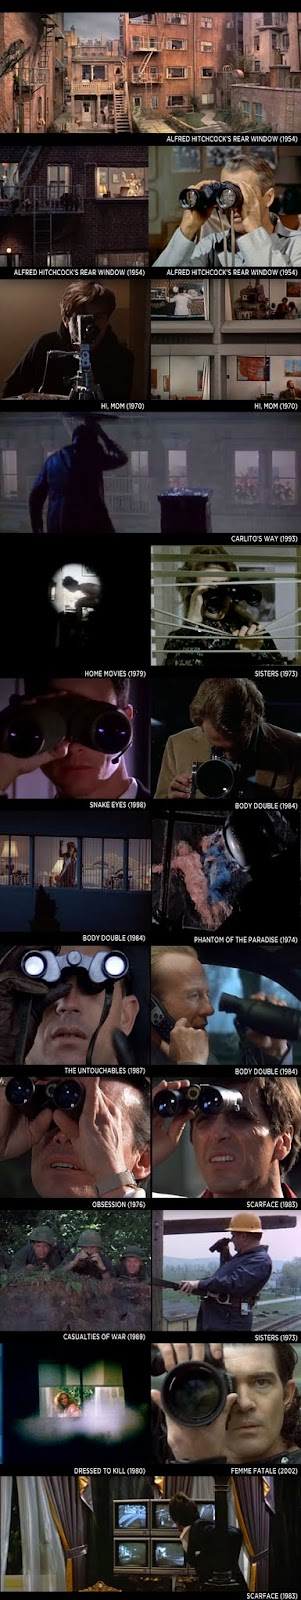 Brian De Palma - Surveillance Voyeur Watching